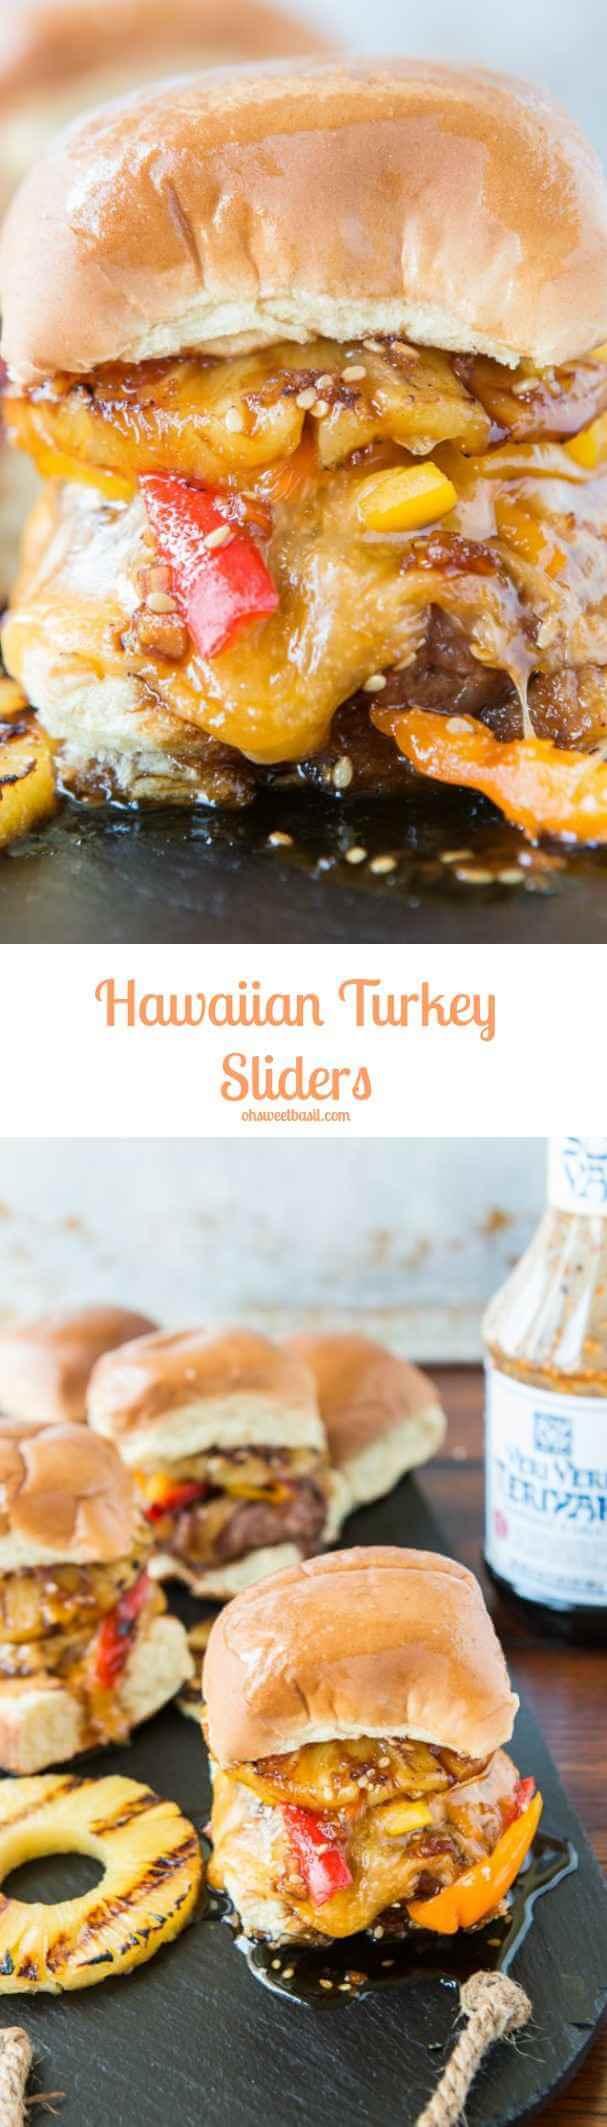 Everyone's favorite Hawaiian Turkey Burger Sliders with pineaple and teriyaki! ohsweetbasil.com